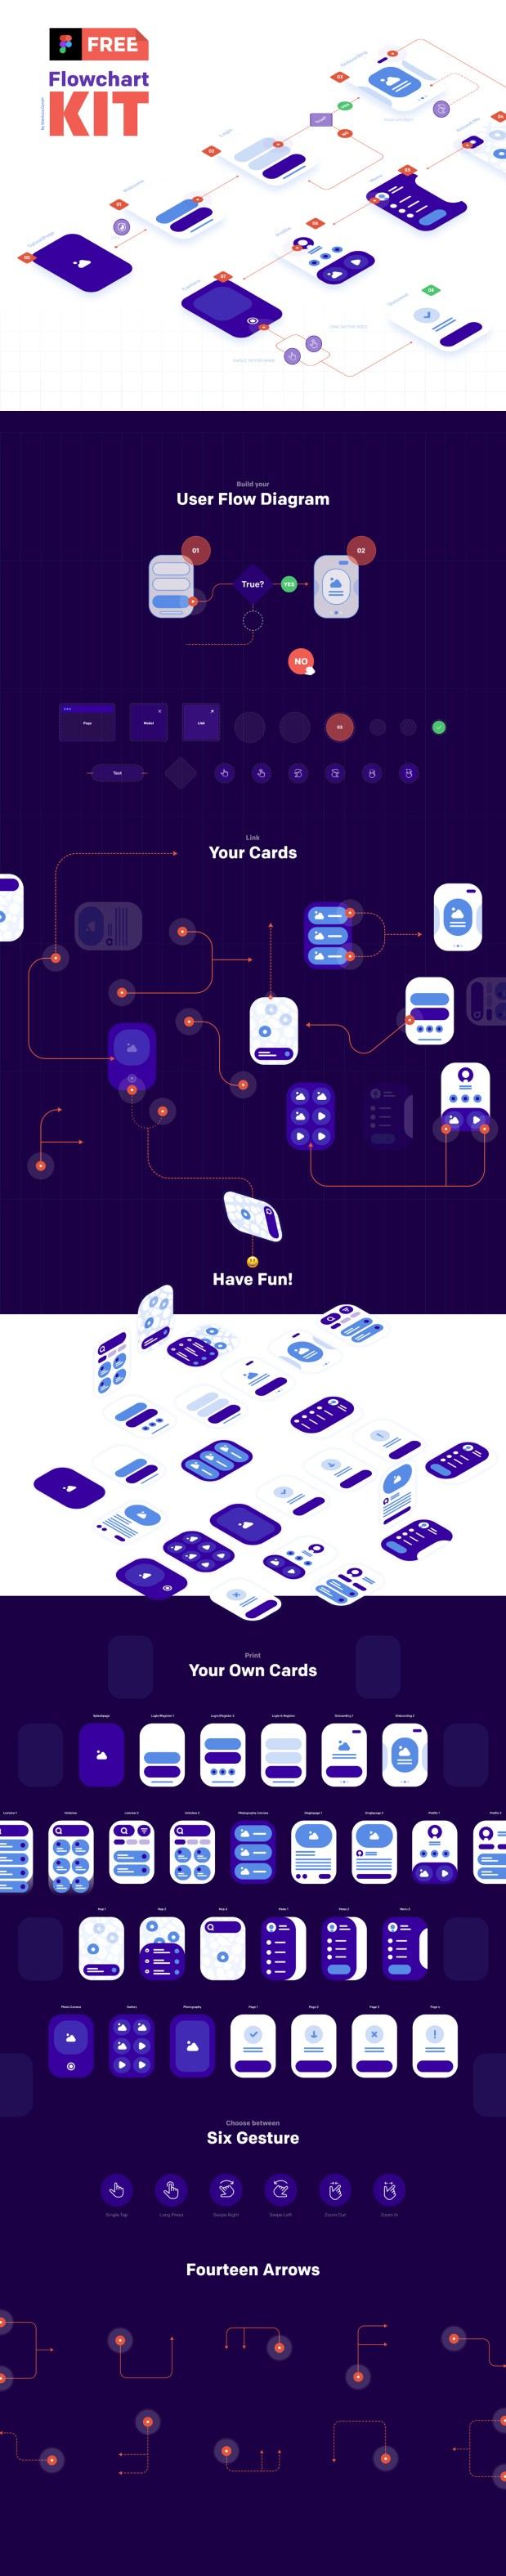 Free Flowchart Kit for Figma